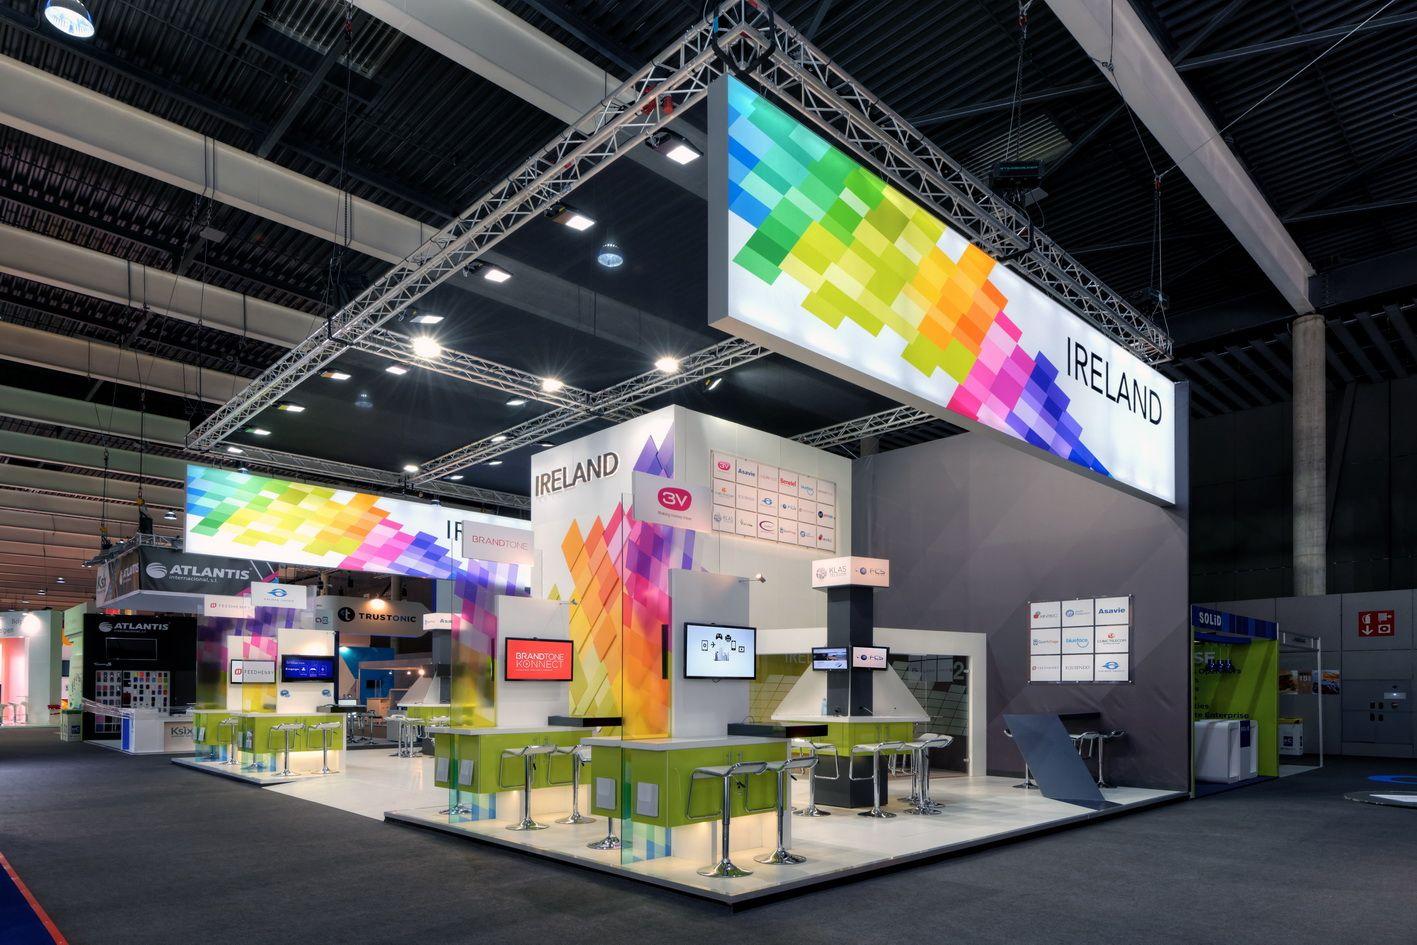 Exhibition Stands Ireland : Enterprise ireland stand gsma mobile world congress